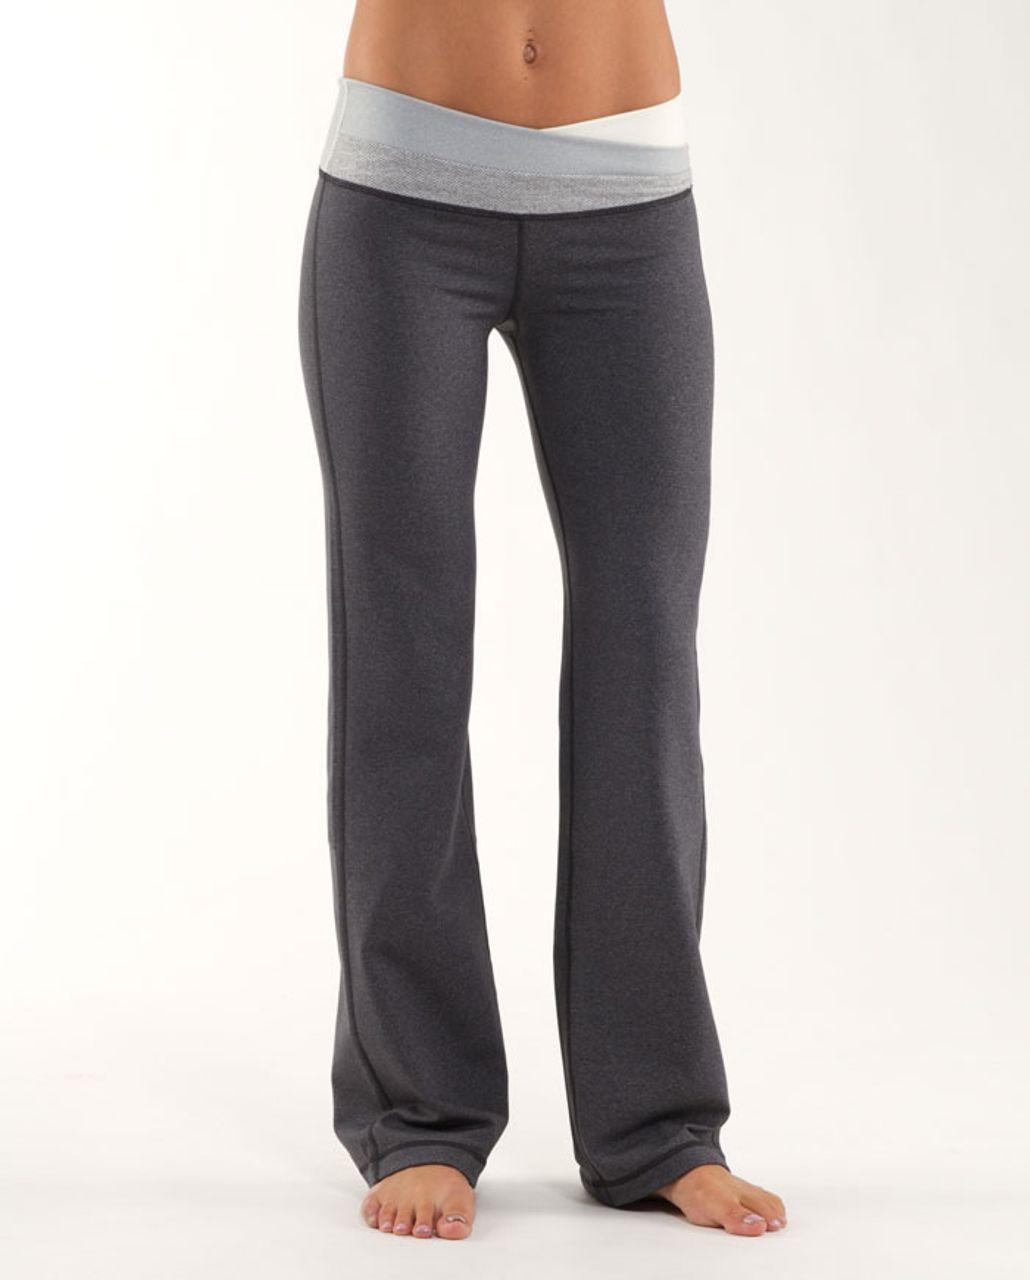 Lululemon Astro Pant (Regular) - Heathered Coal /  Ghost /  Ghost Blurred Grey Mini Stripe